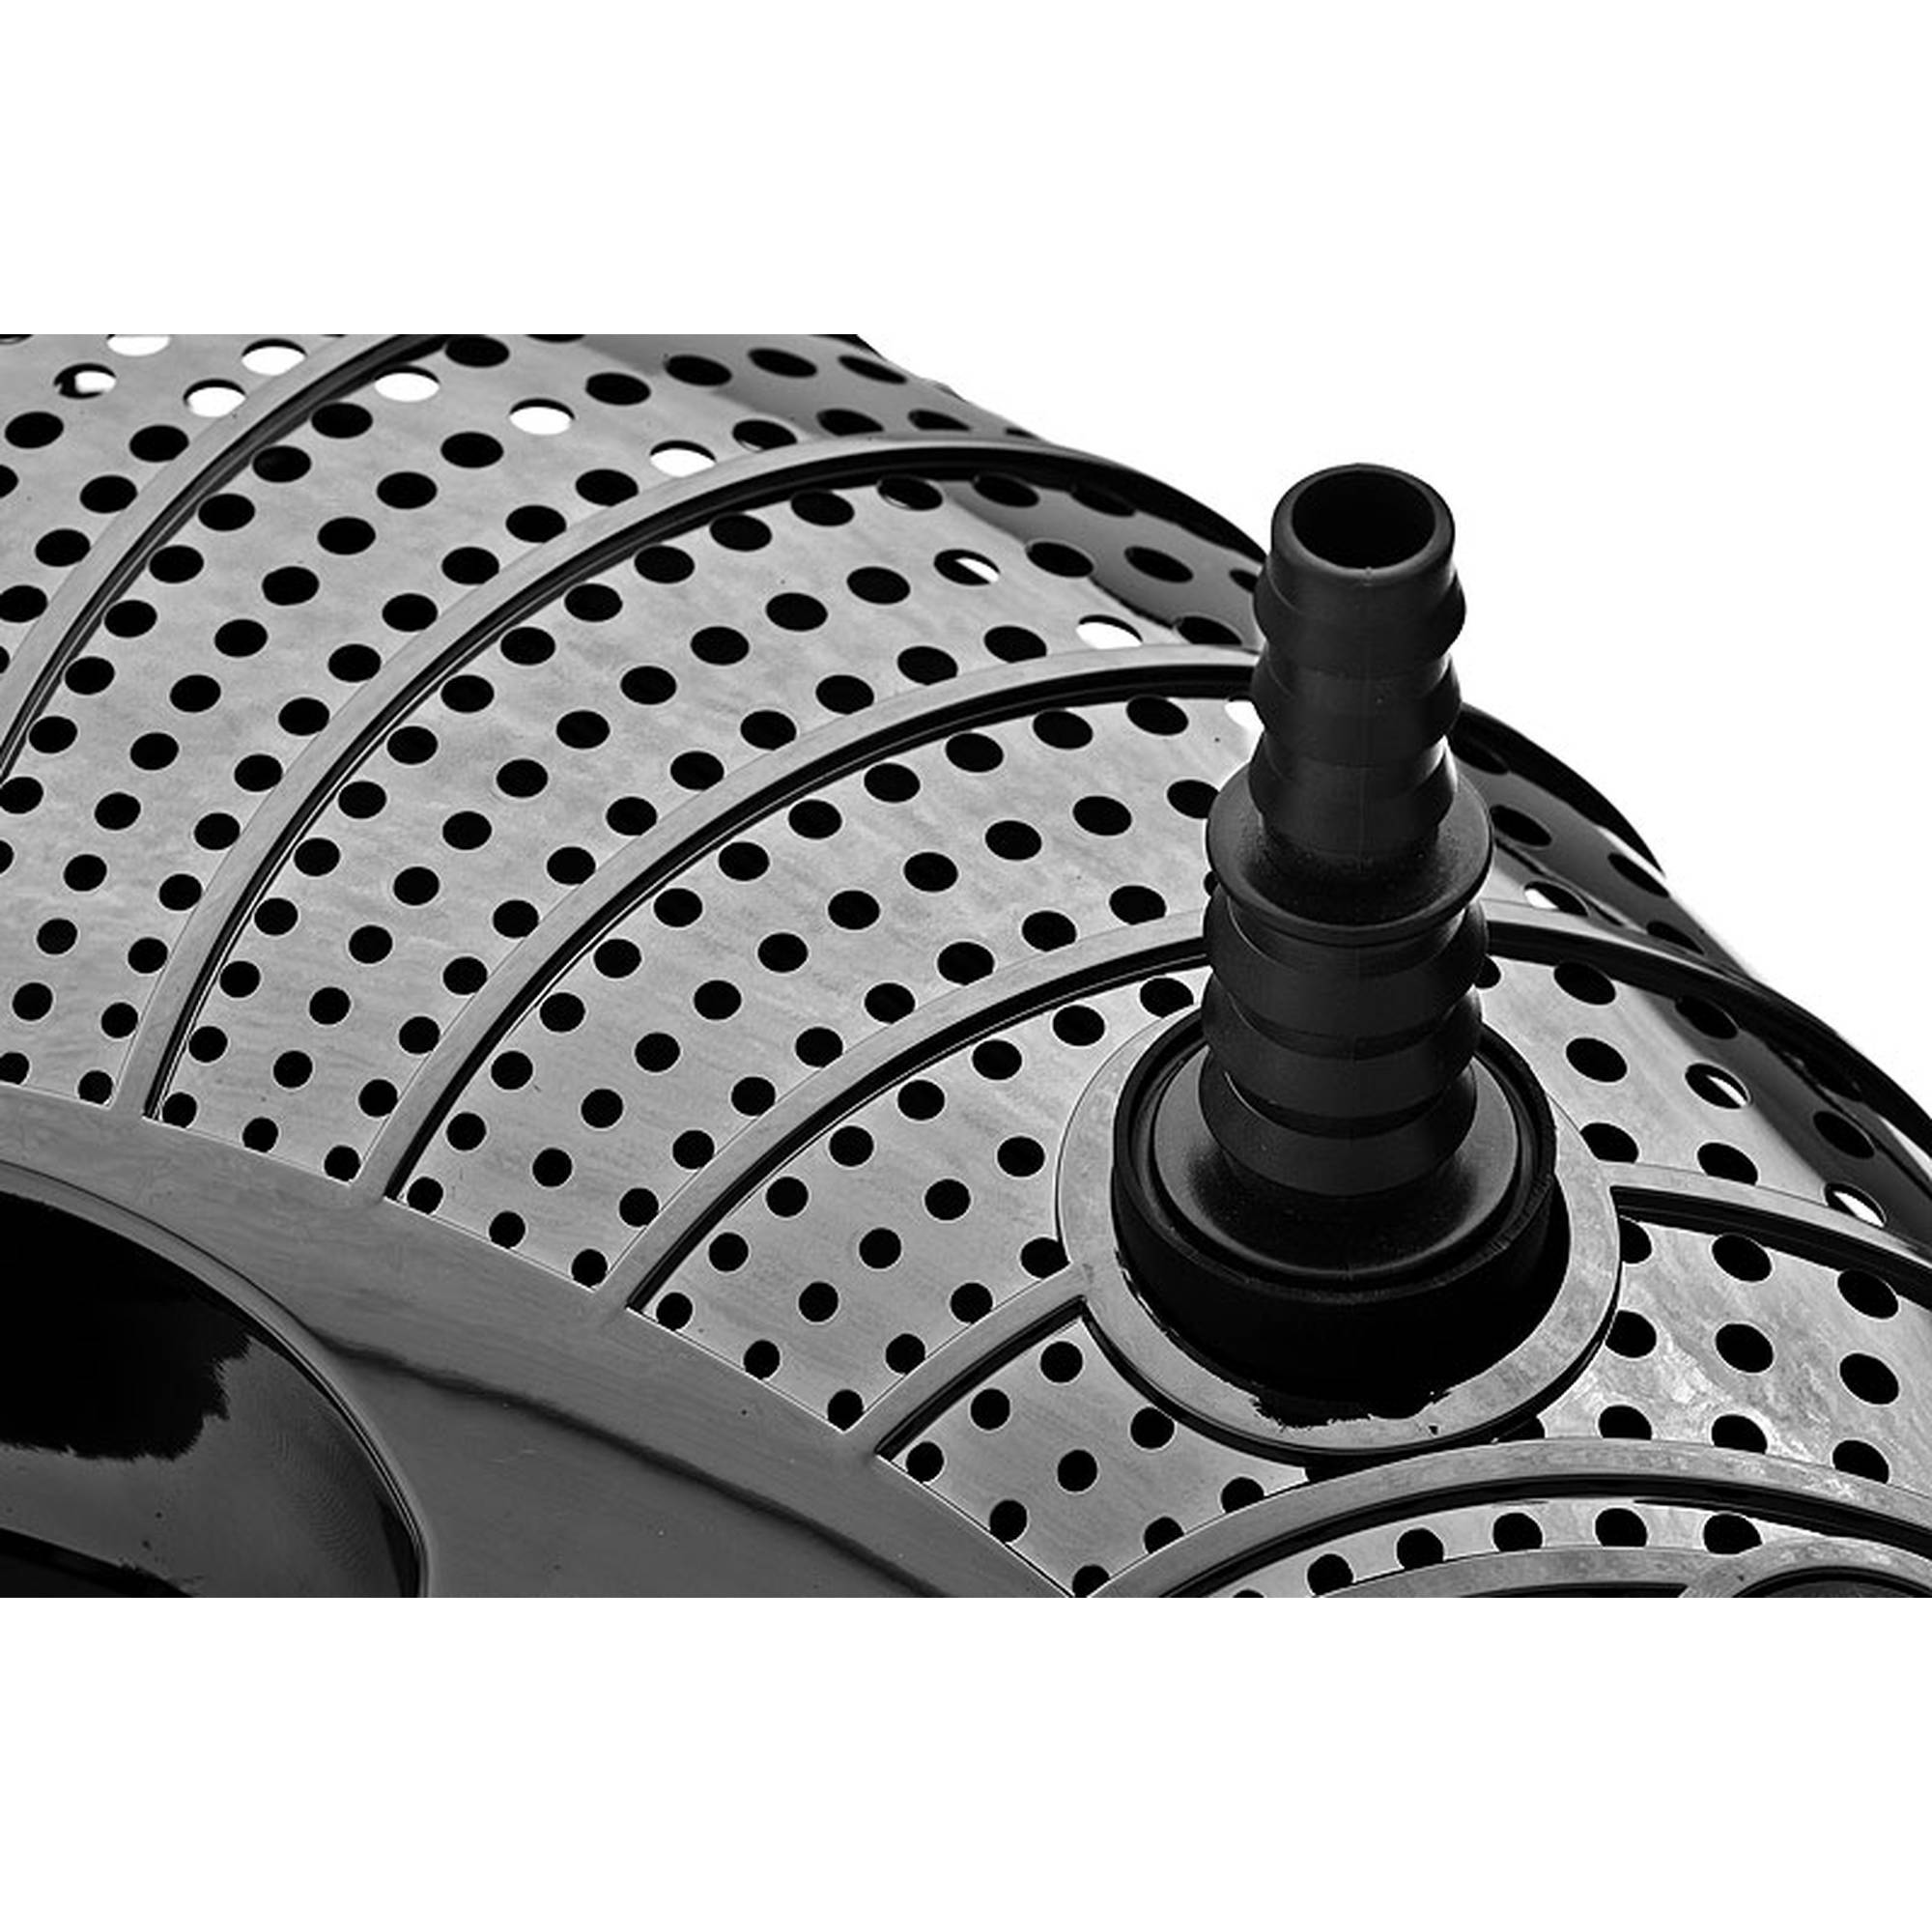 Filter- und Bachlaufpumpe Aqua Craft Premium Eco P6100E von Heissner